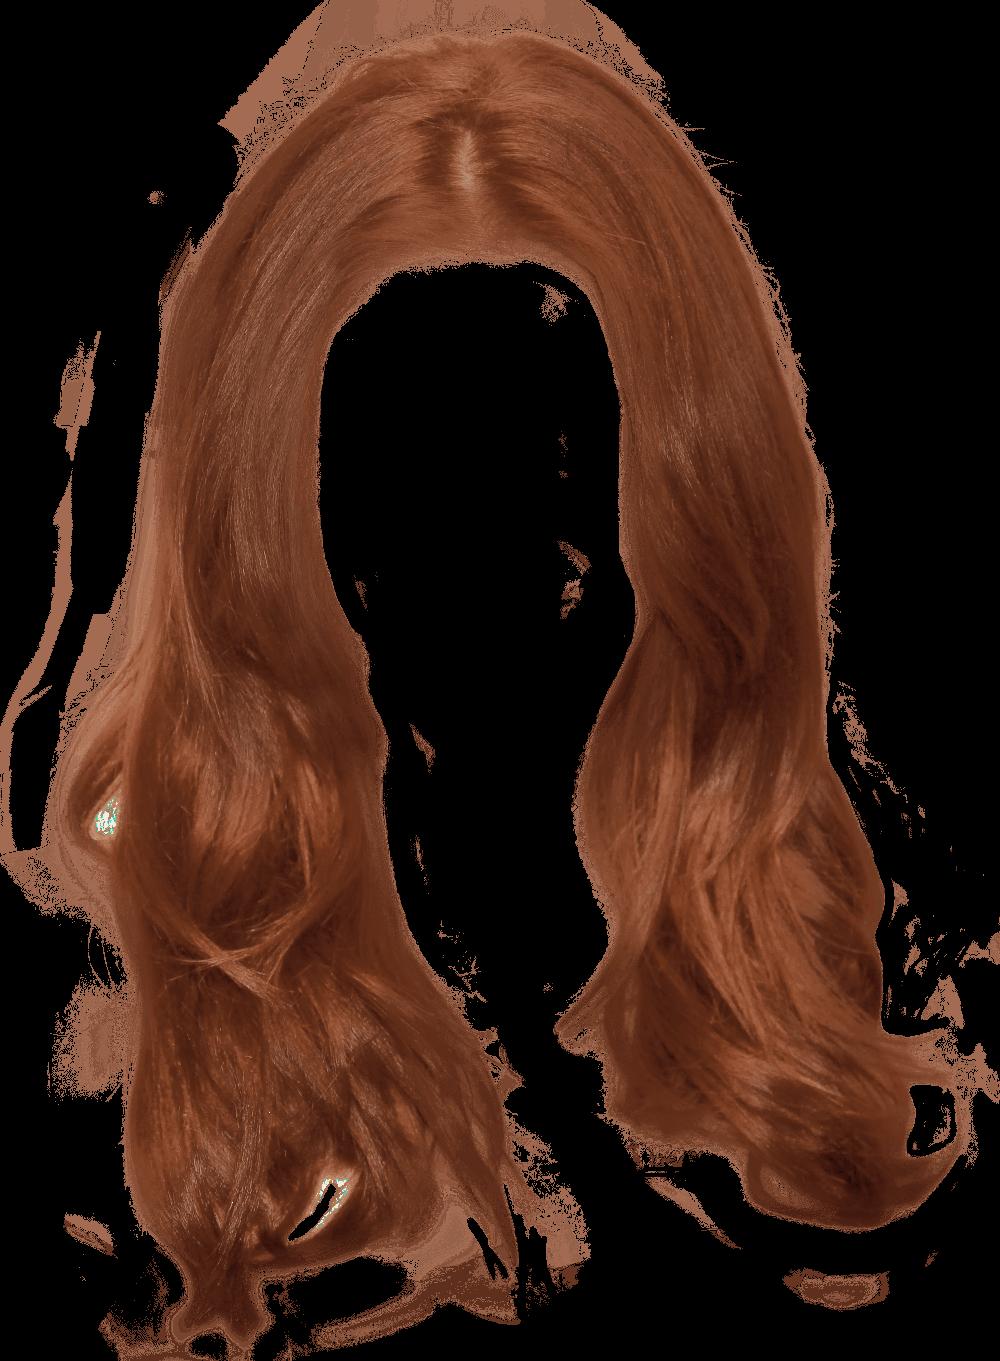 Red Hair clipart ginger hair Transparent PNG Hair StickPNG Women